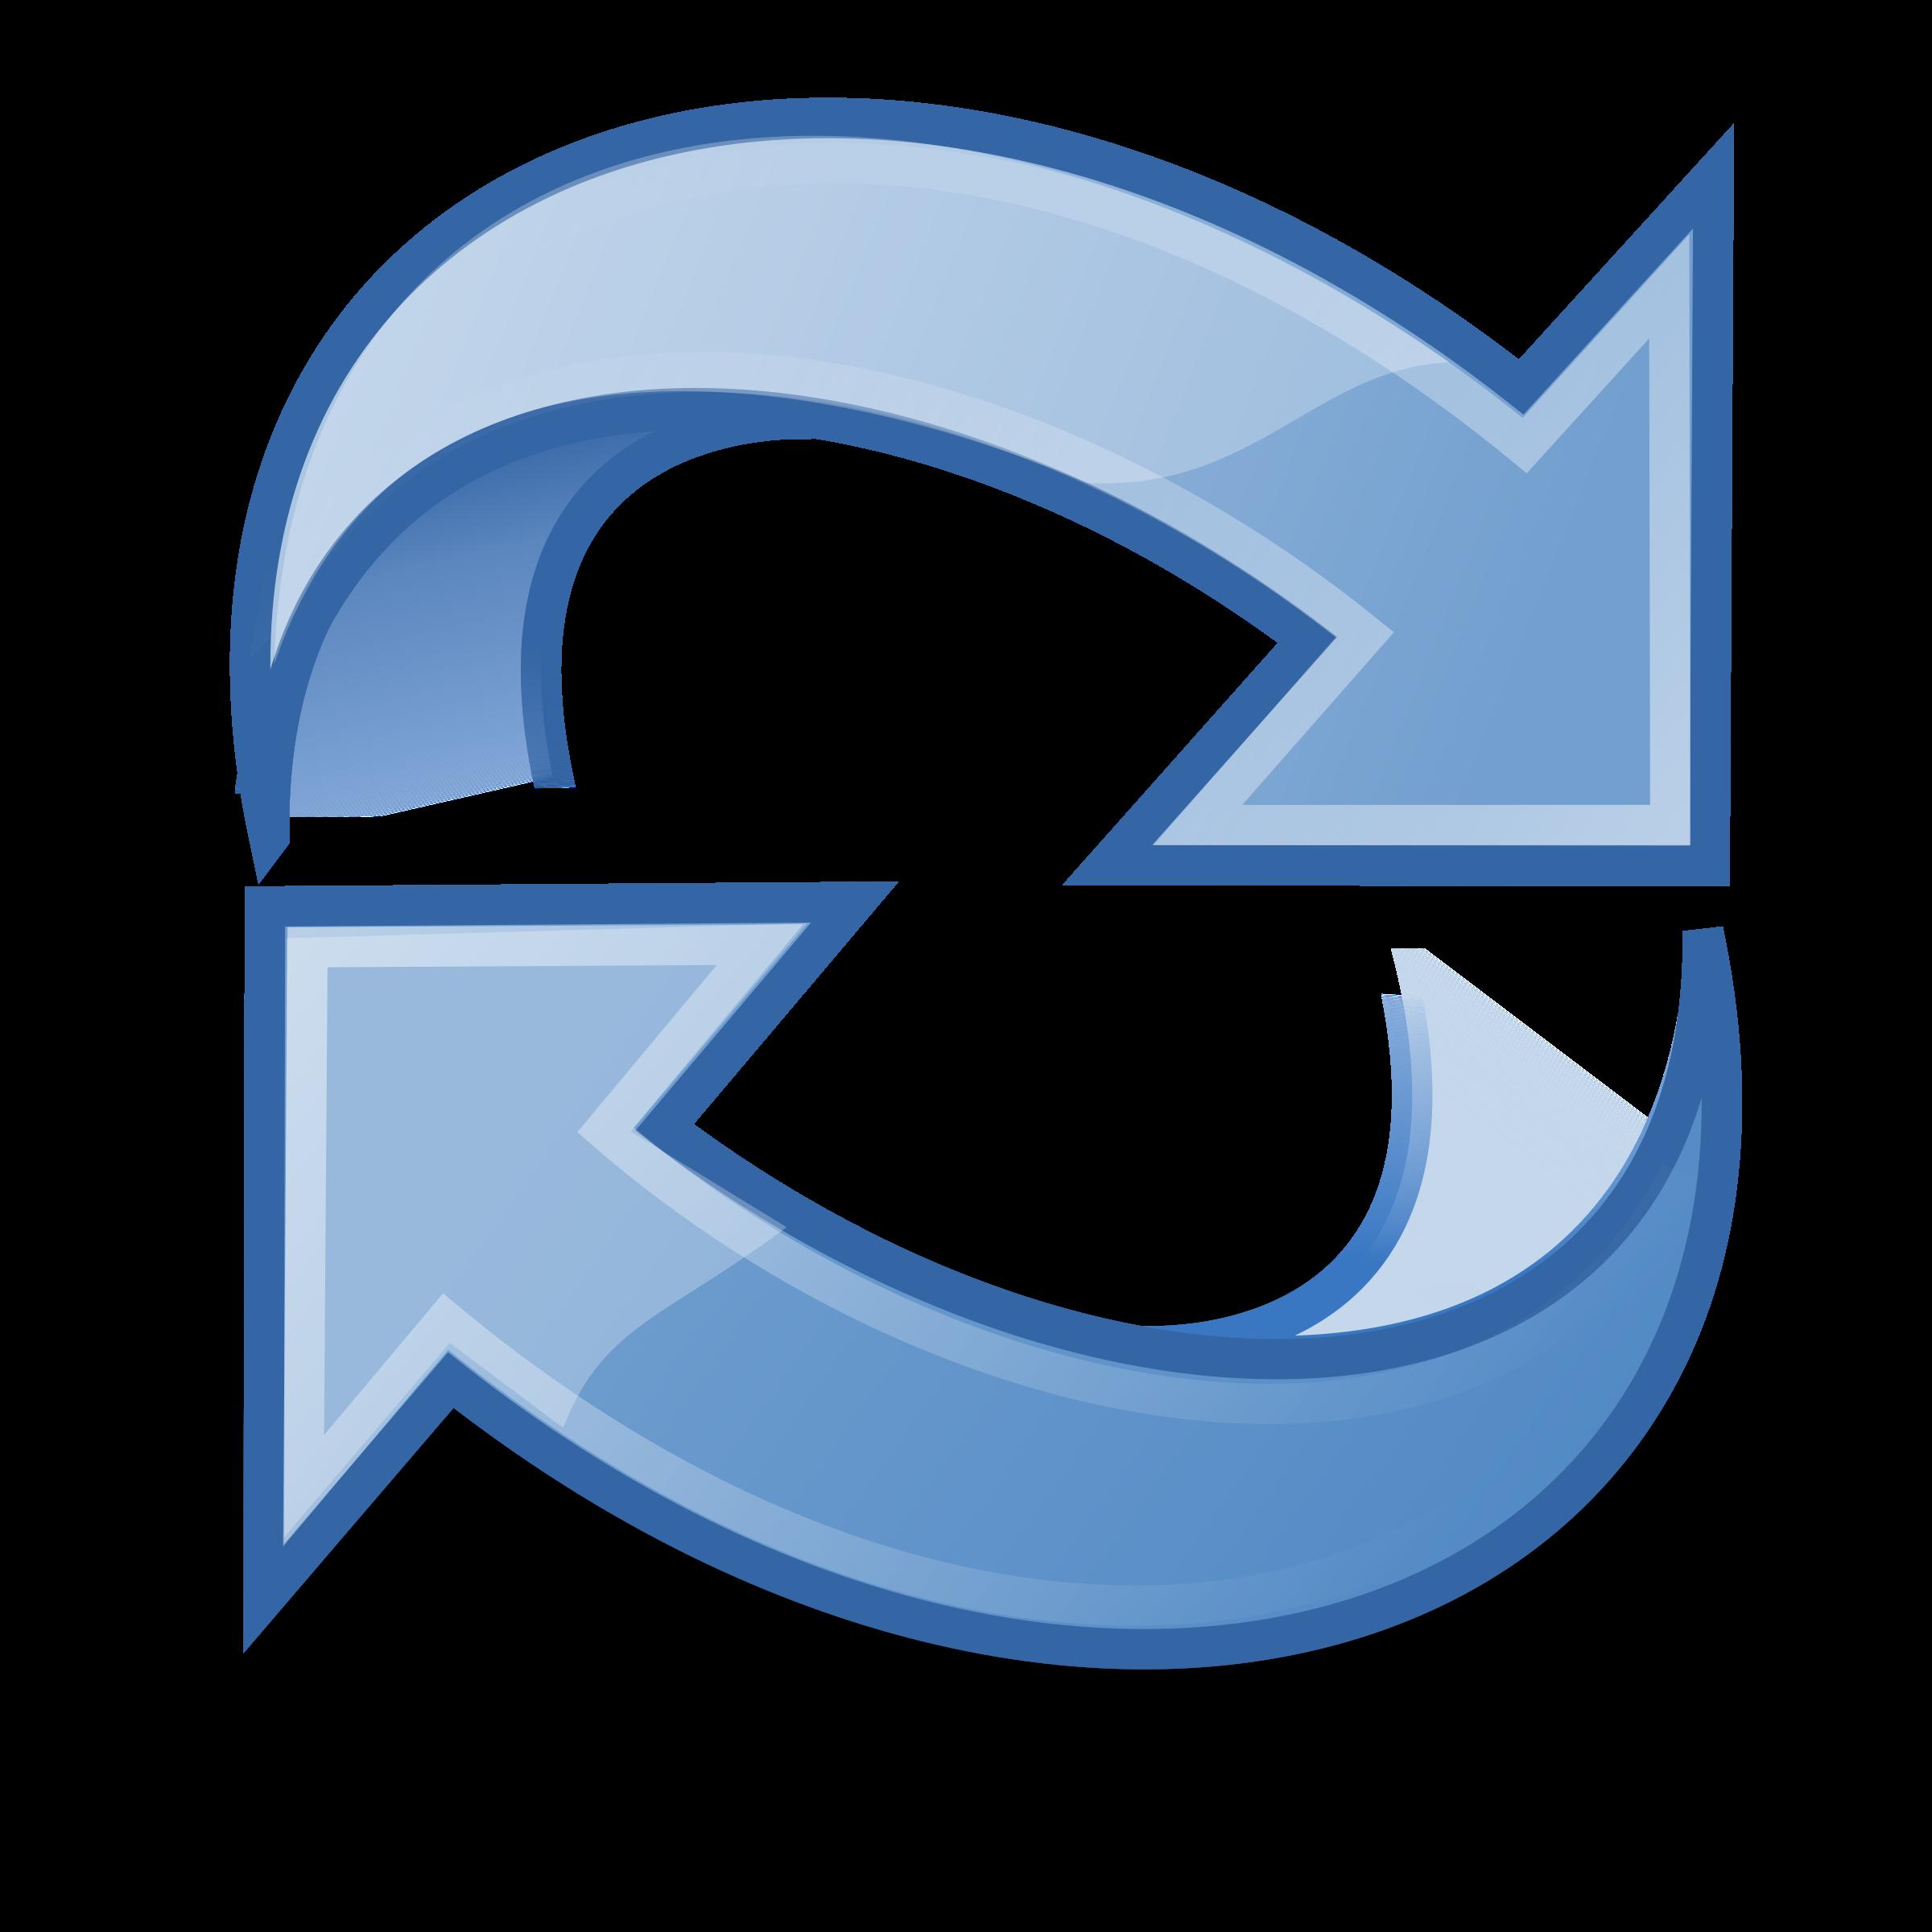 Refresh Icon Vector Clipart image.